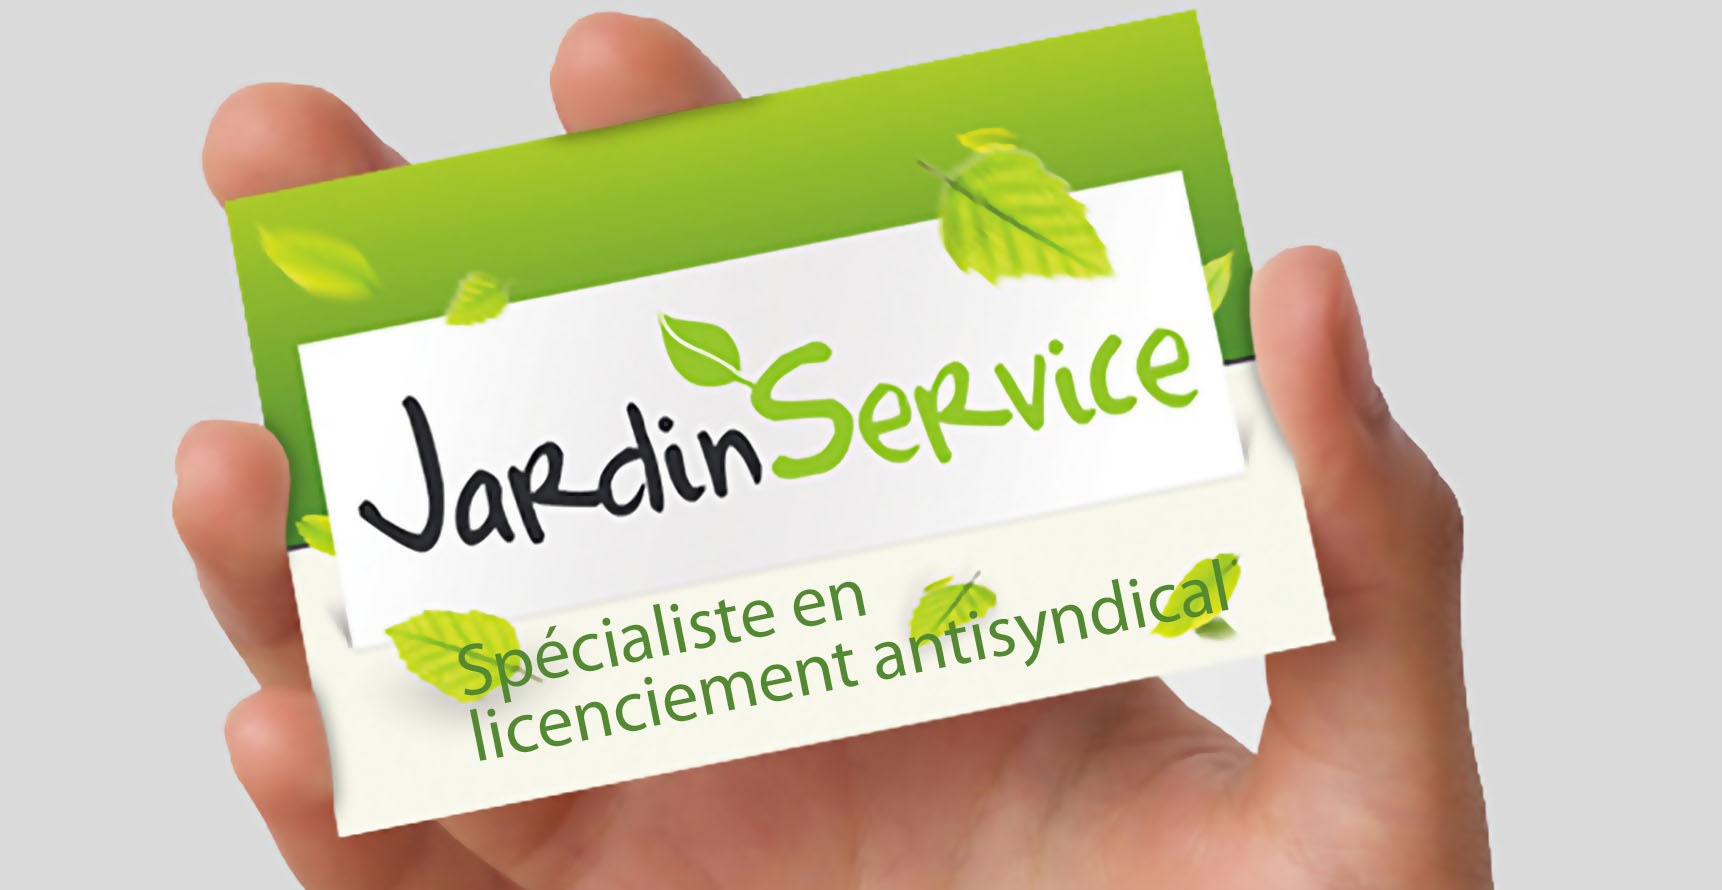 Jardin Service - Marseille : « Le patronat tape à tout-va »